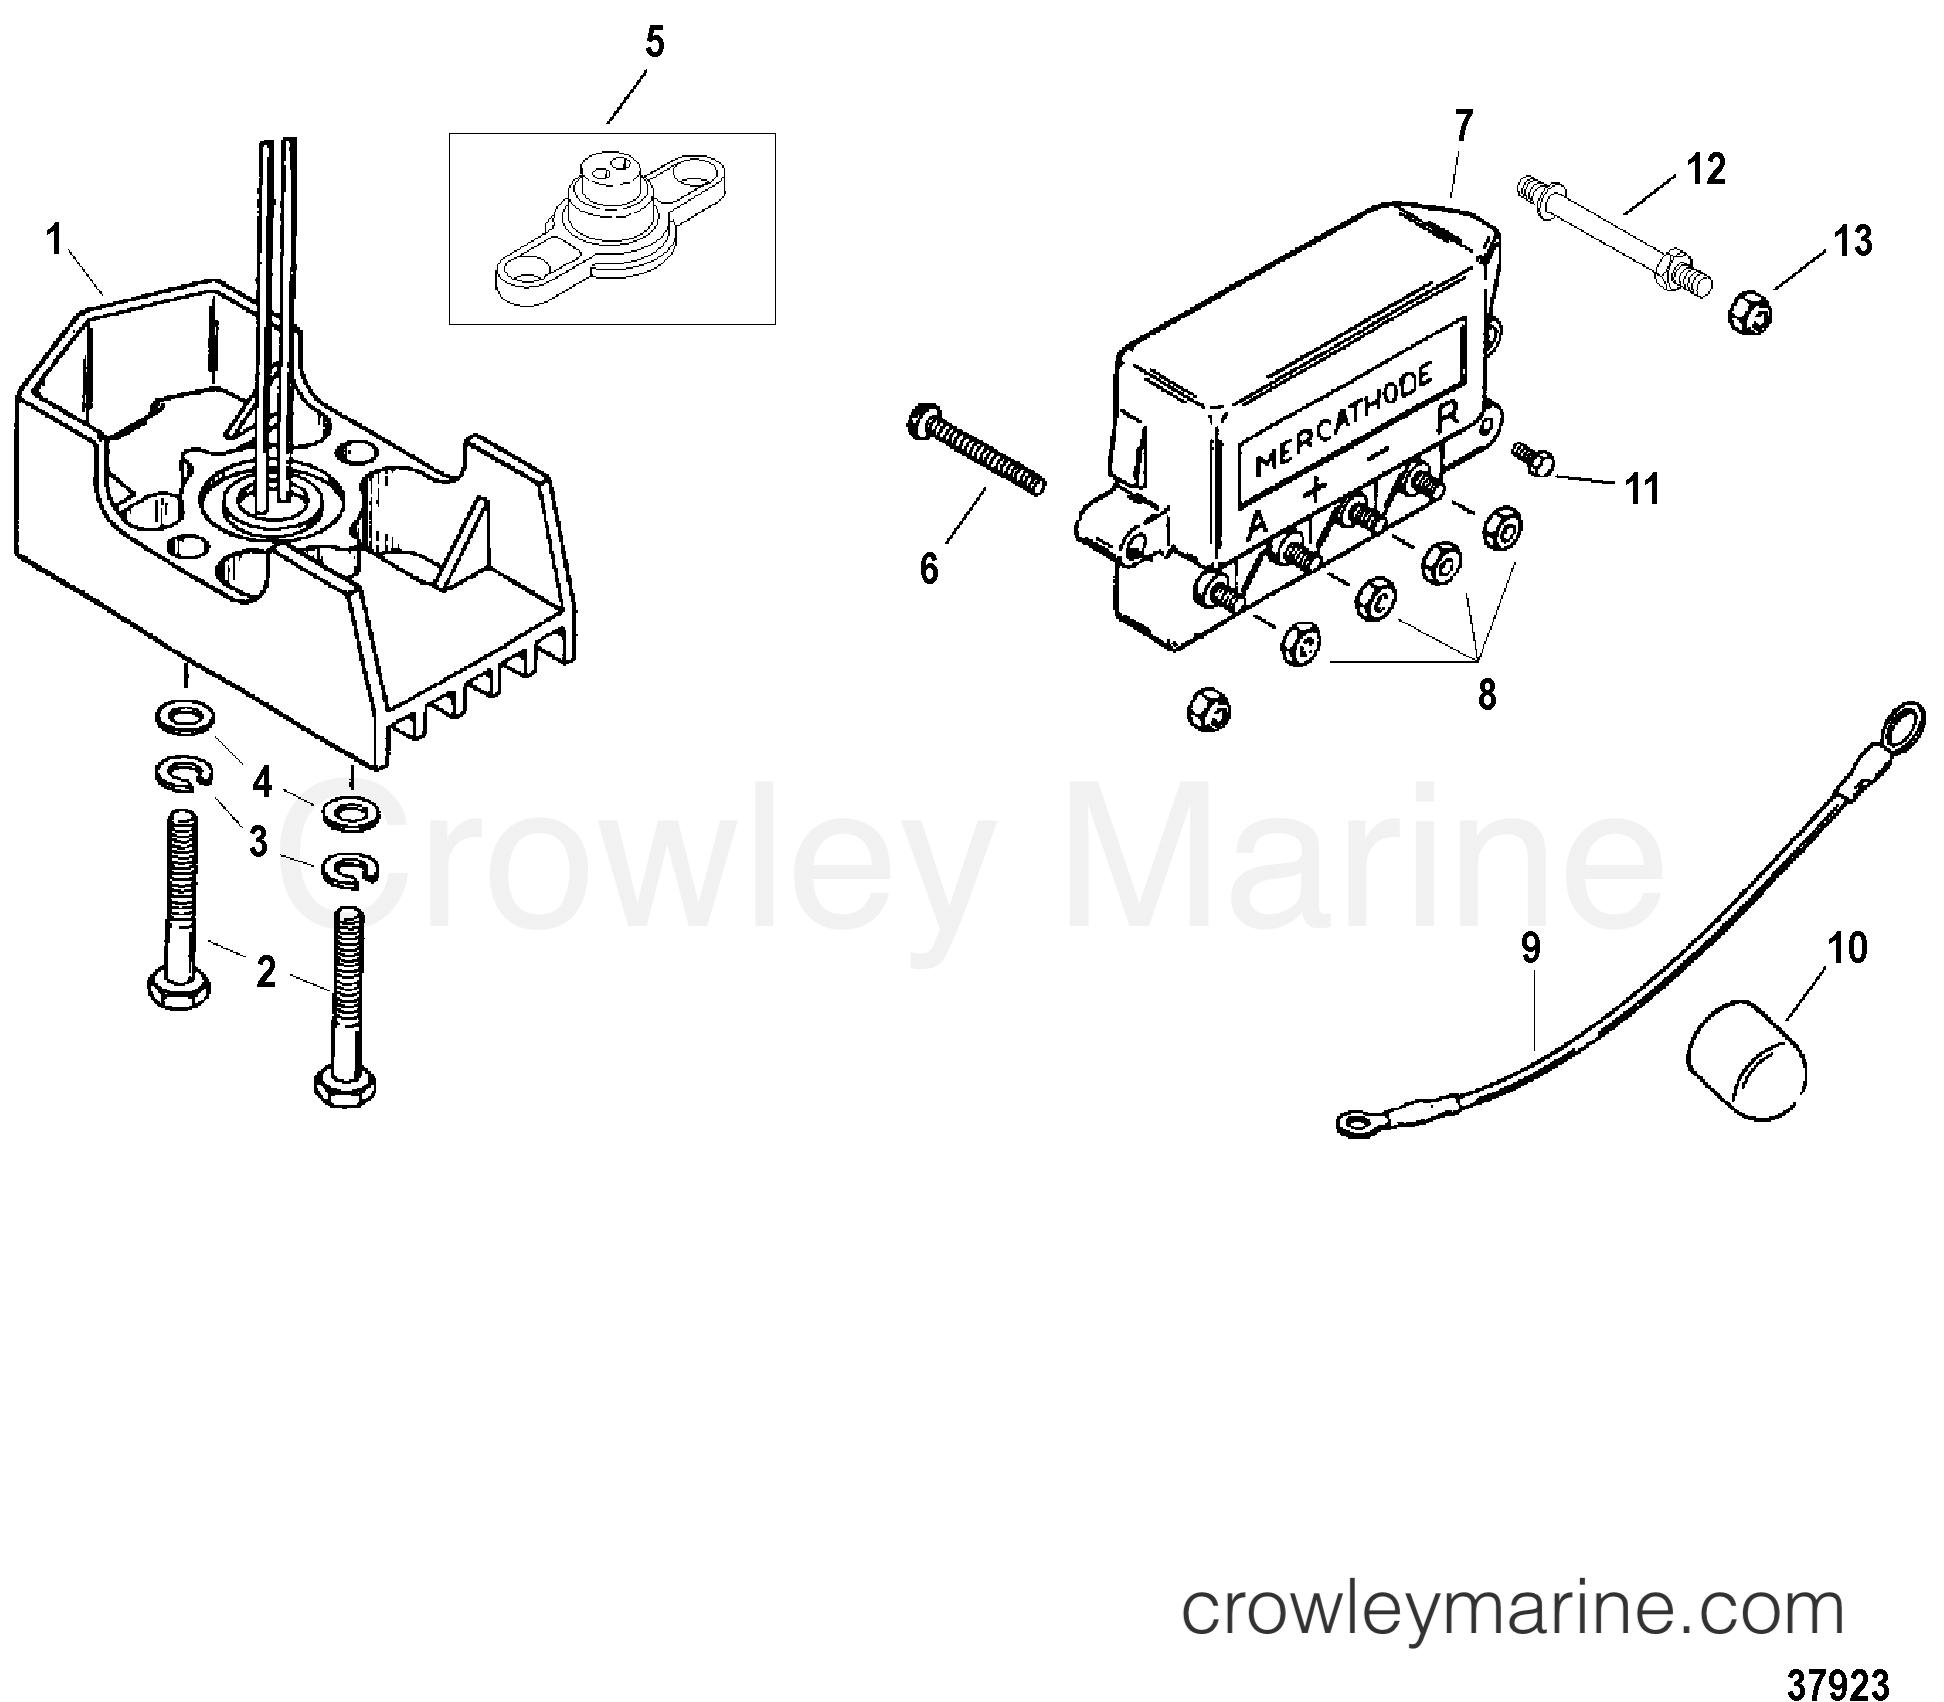 Mercathode Wiring Diagram from cdn.crowleymarine.com